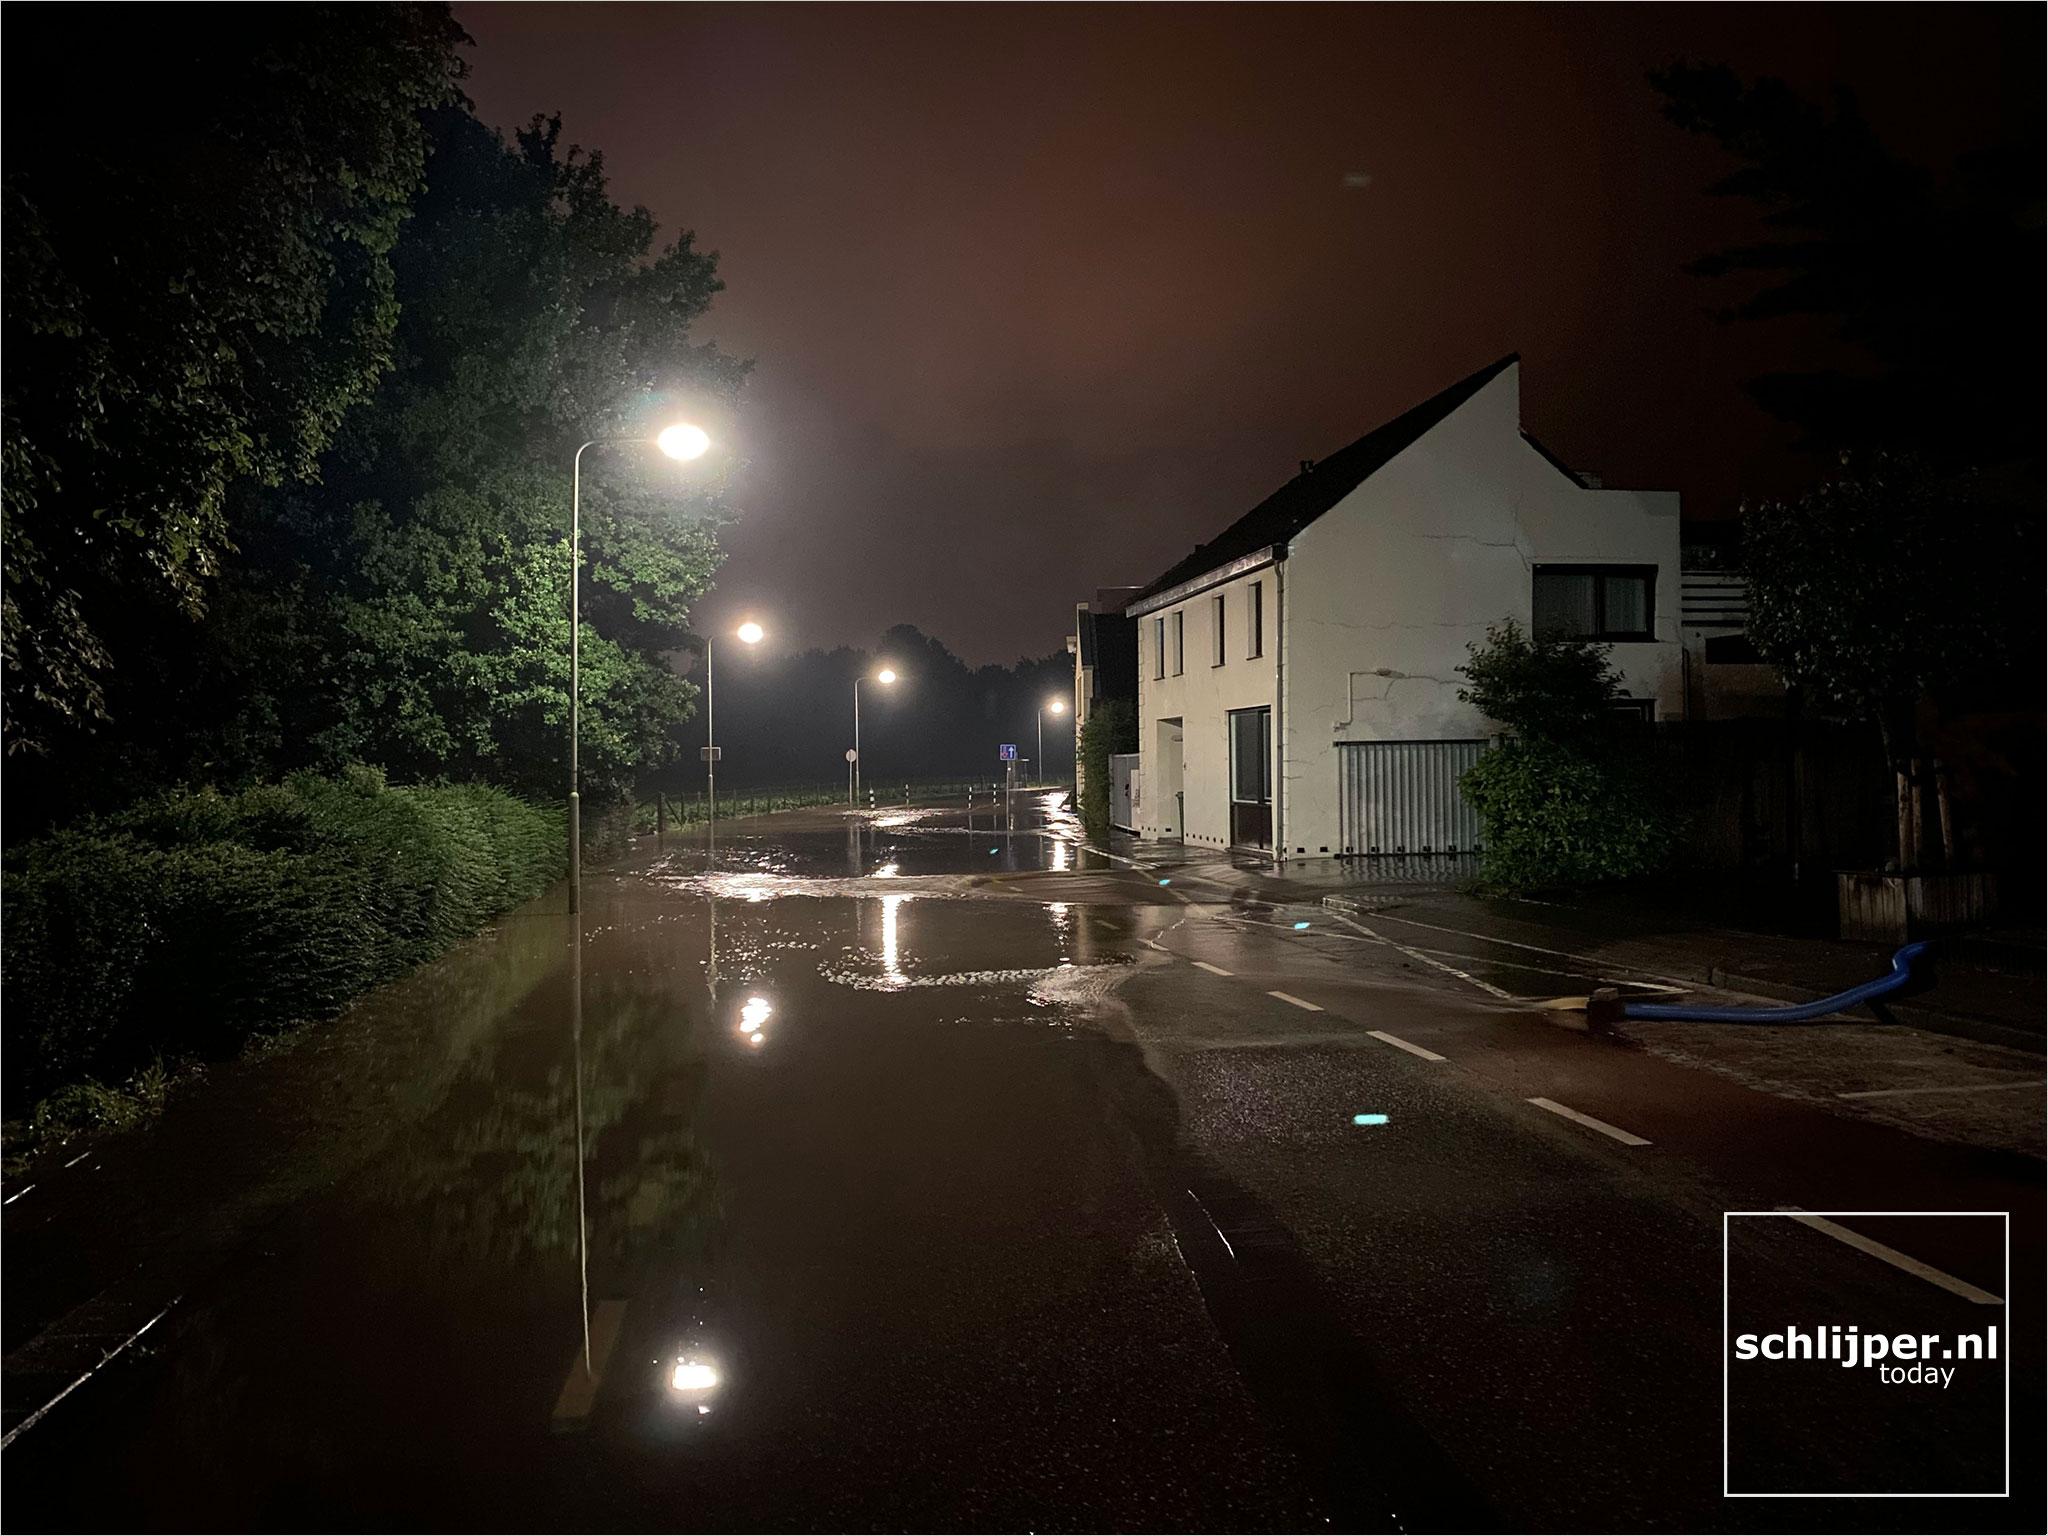 The Netherlands, Rothem, 16 juli 2021